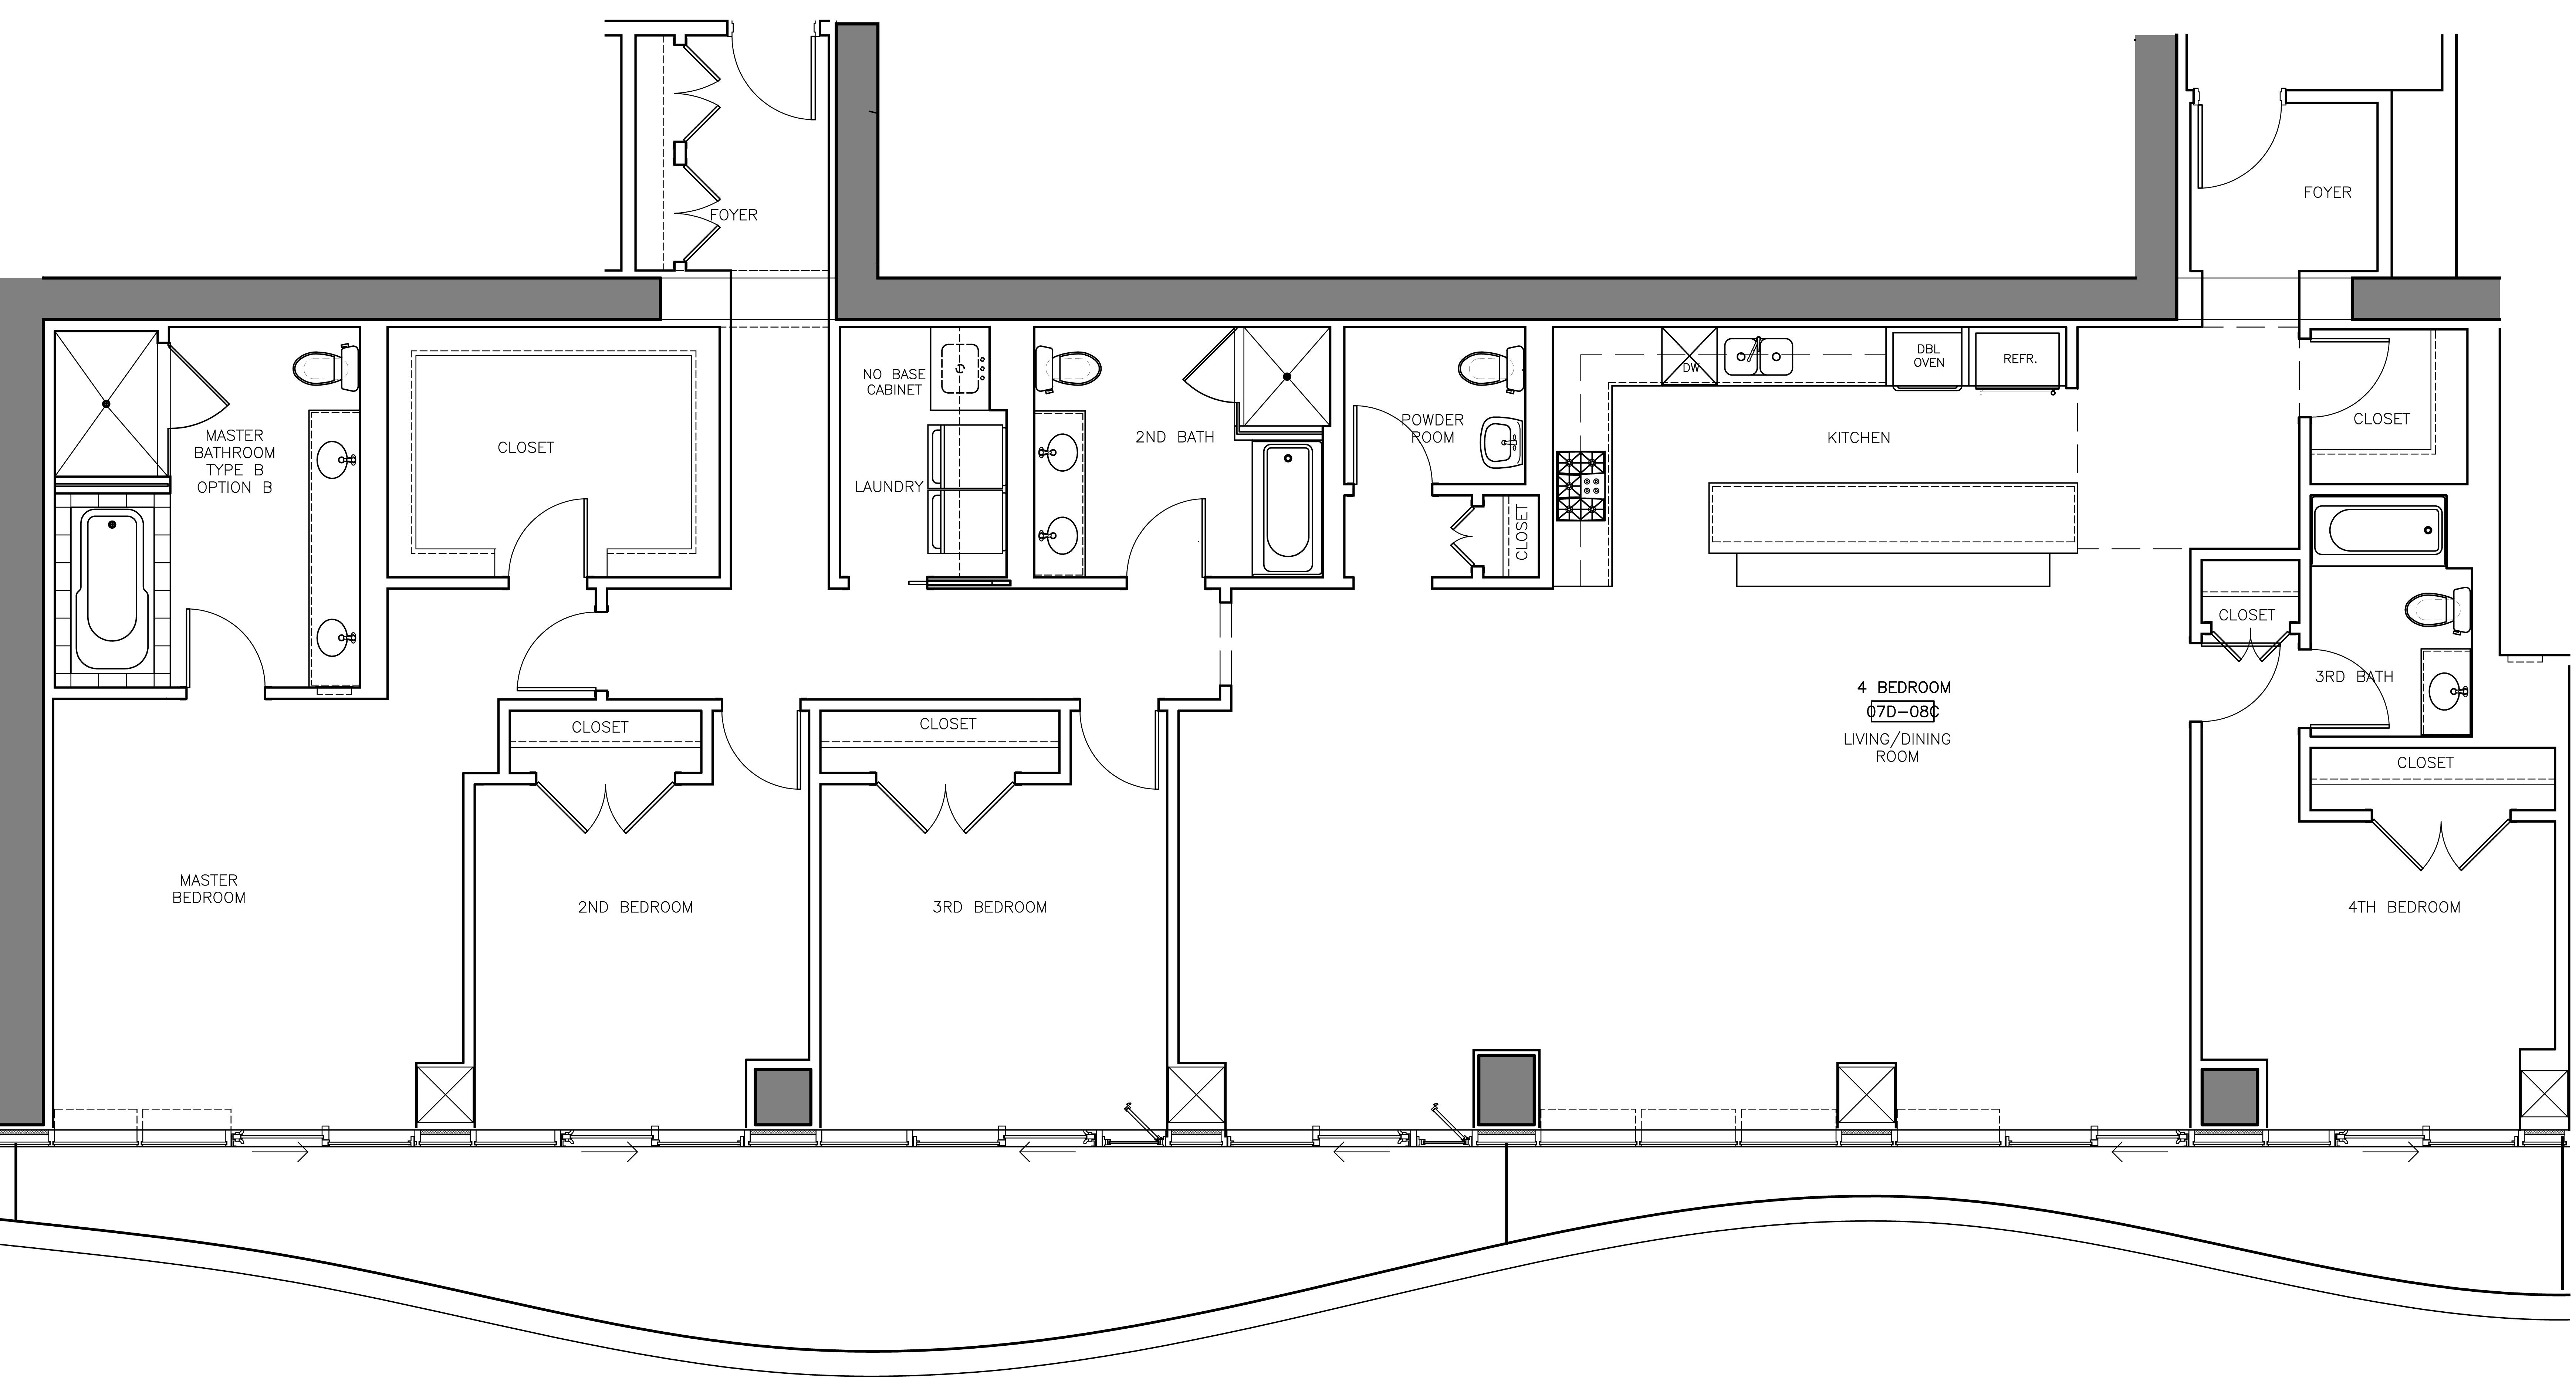 Aqua penthouse, 225 N Columbus Dr, Chicago